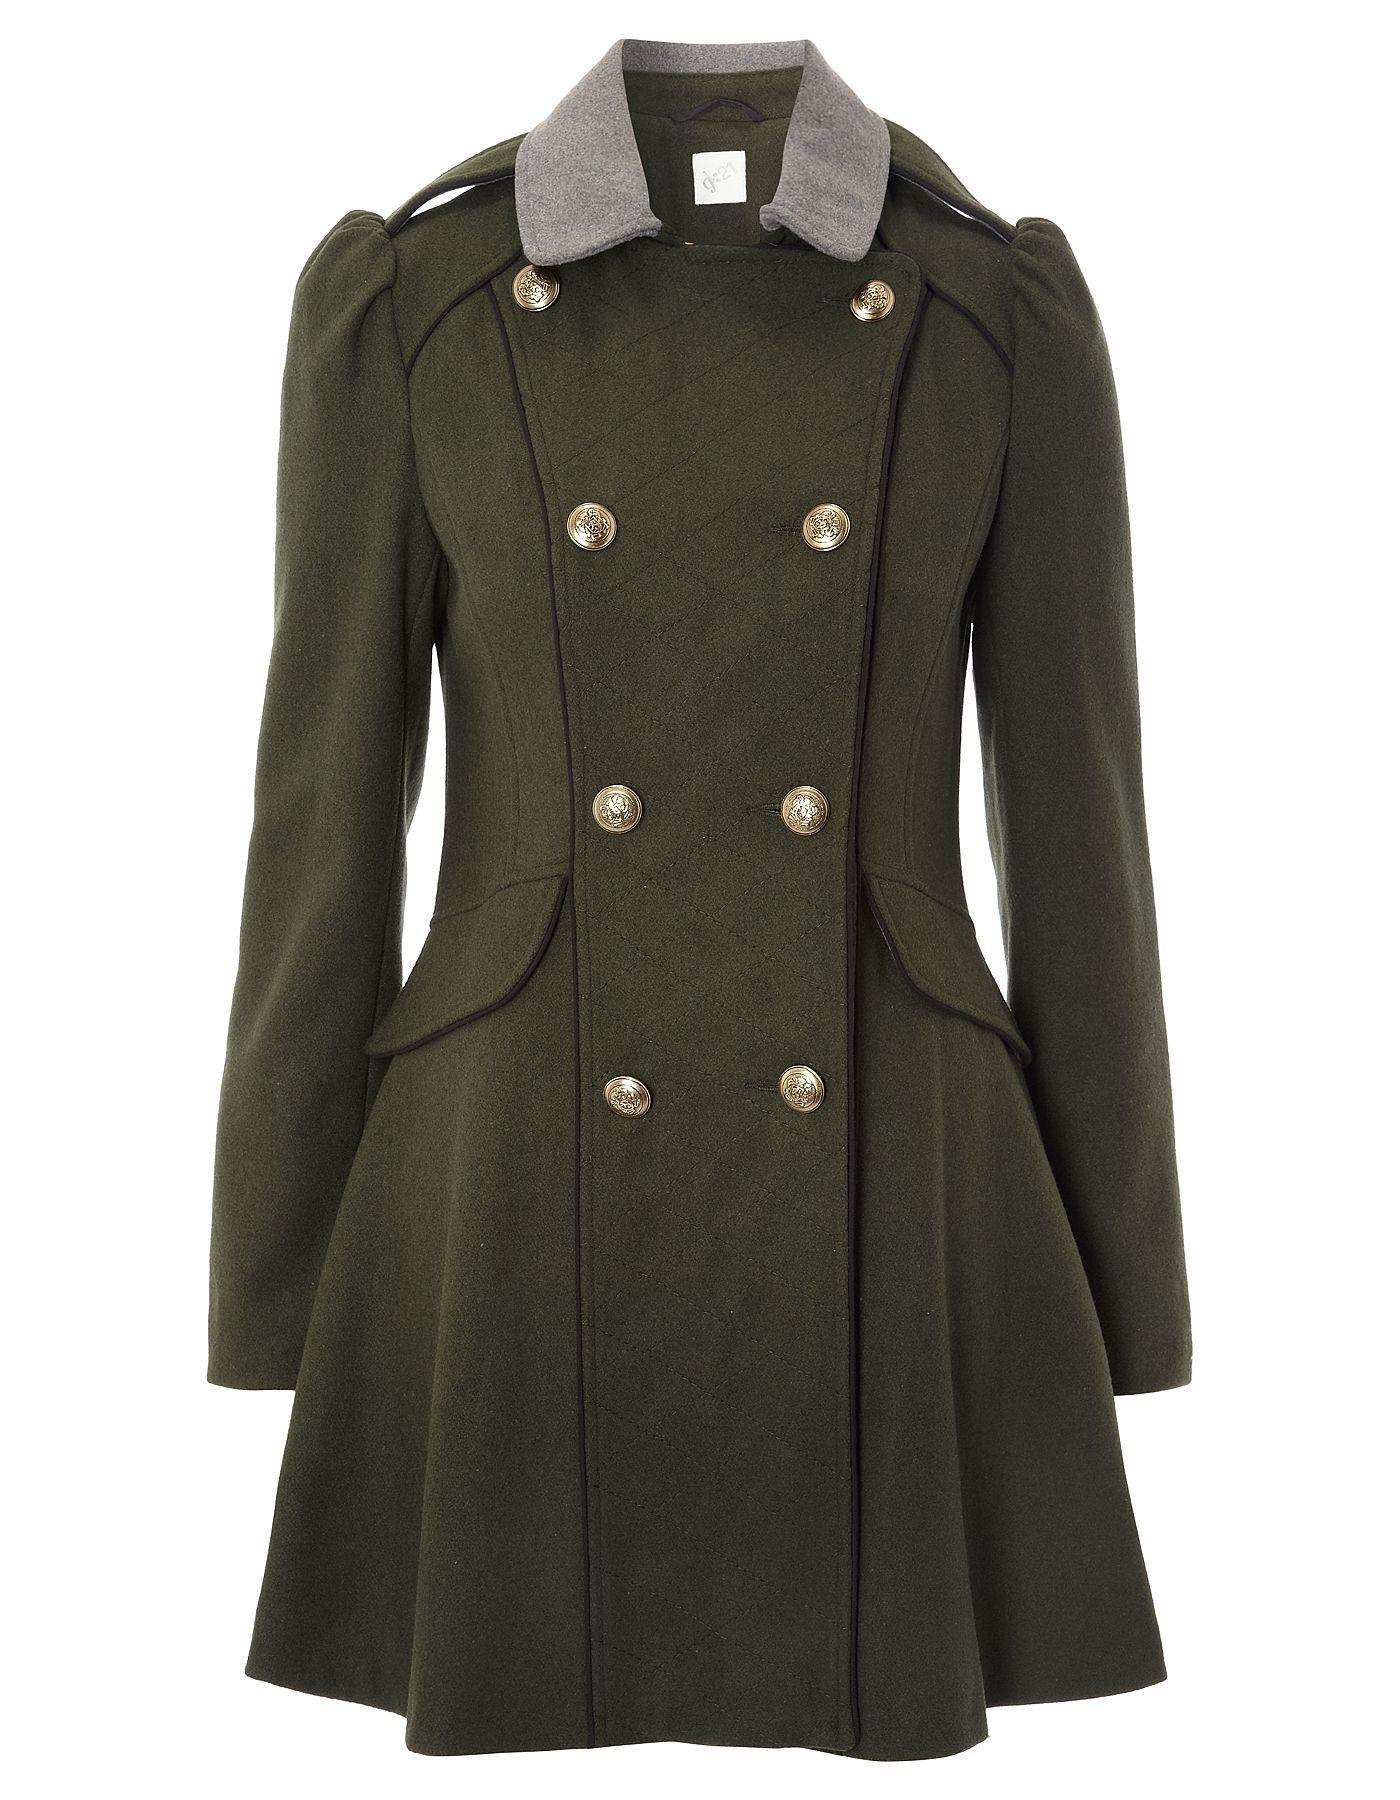 G21 Military Coat | Women | George at ASDA | My Style | Pinterest ...